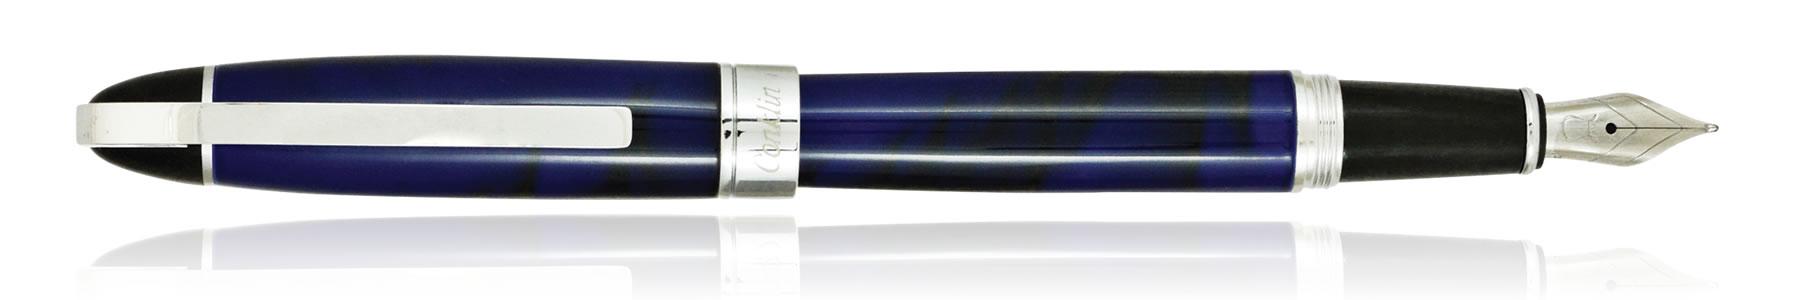 Cinnamon Brown Conklin Victory Ballpoint Pen Brand New In Box